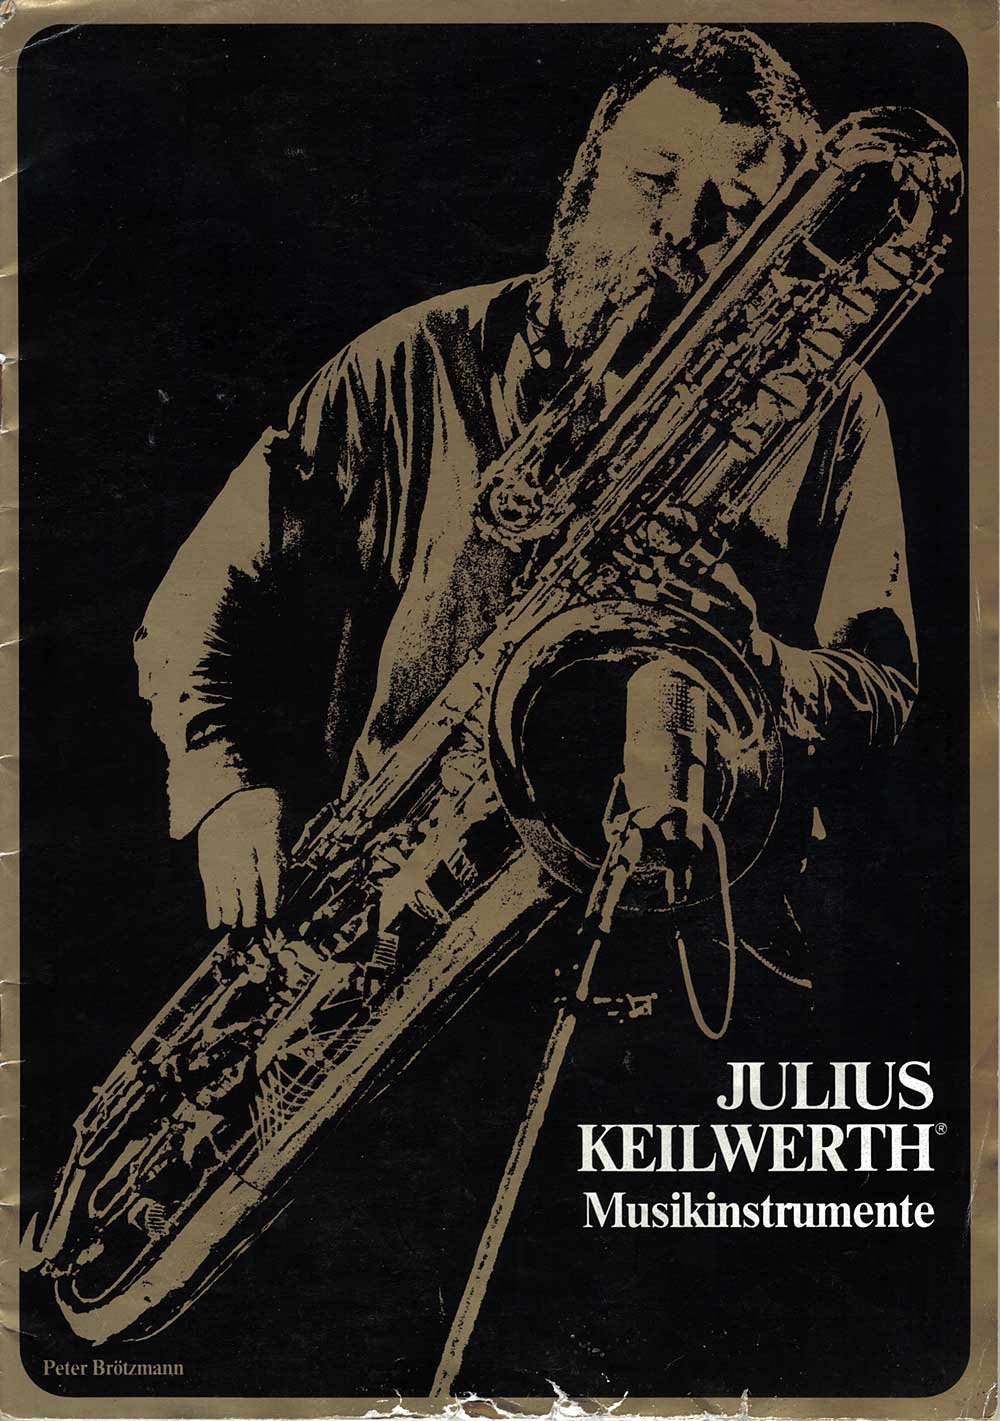 Julius Keilwerth, saxophone, front cover, brochure, German, bass sax, sax player, black, gold, vintage, 1970s